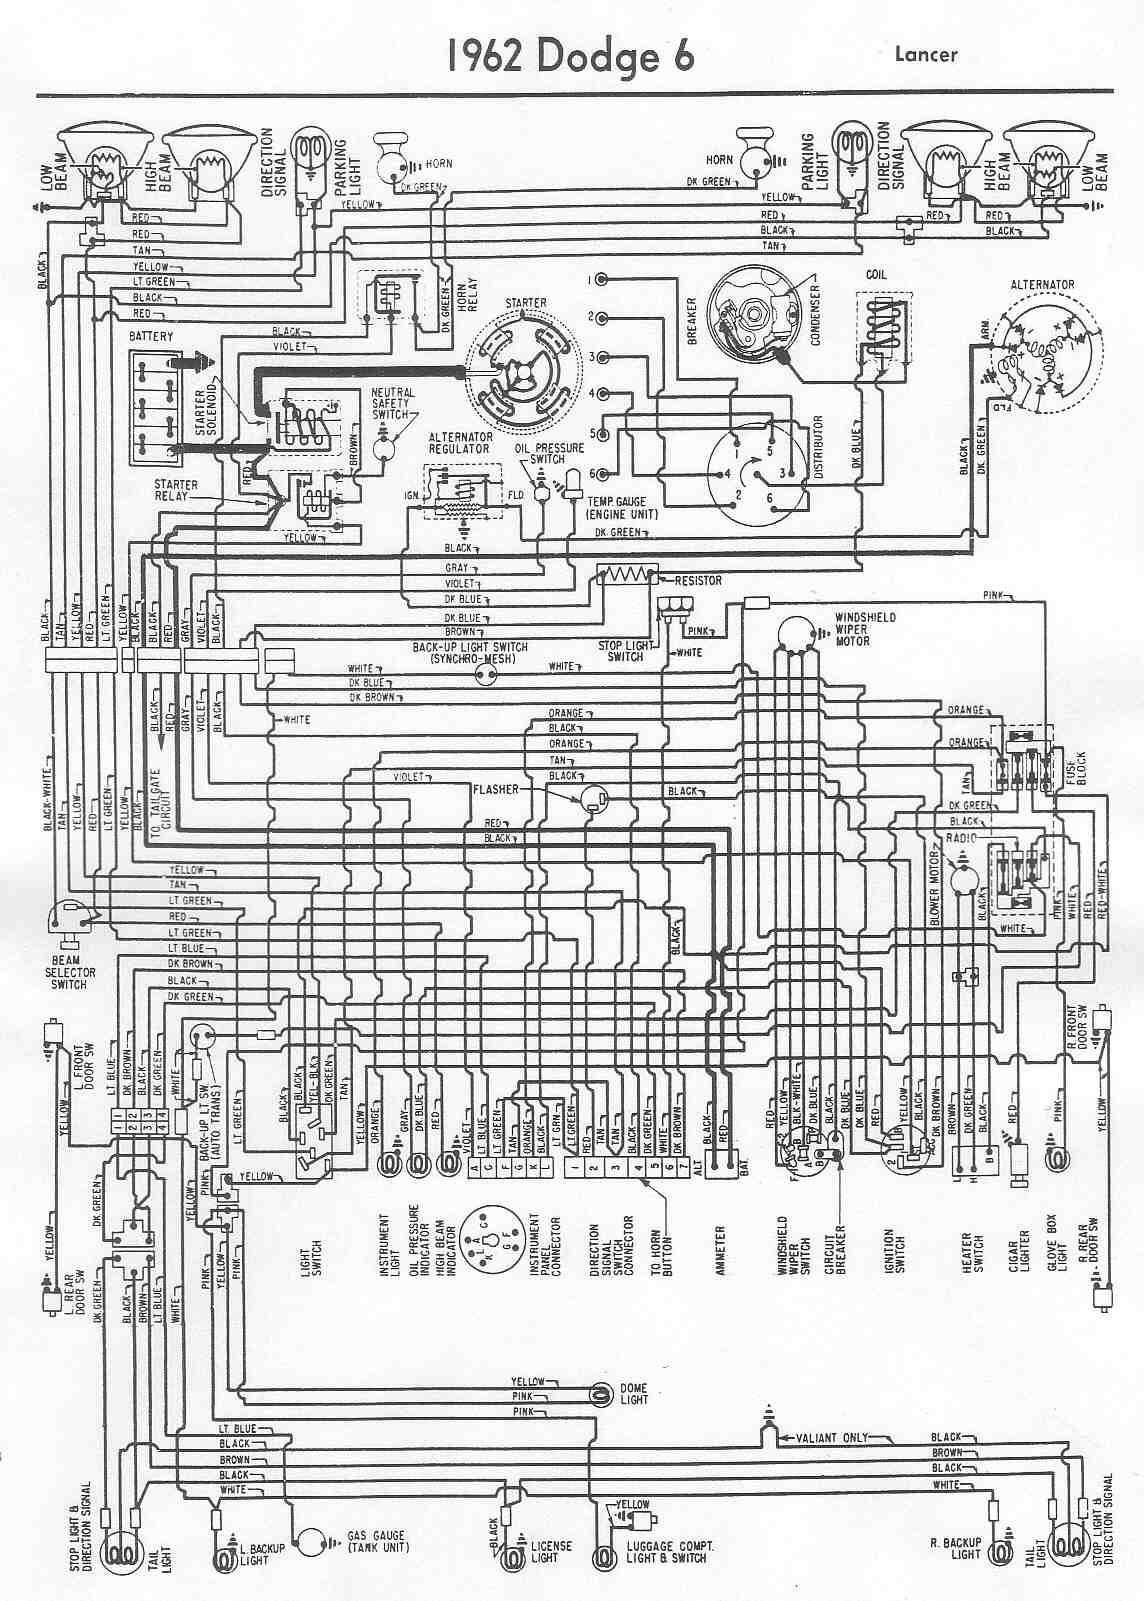 dodge car manuals wiring diagrams pdf fault codes. Black Bedroom Furniture Sets. Home Design Ideas